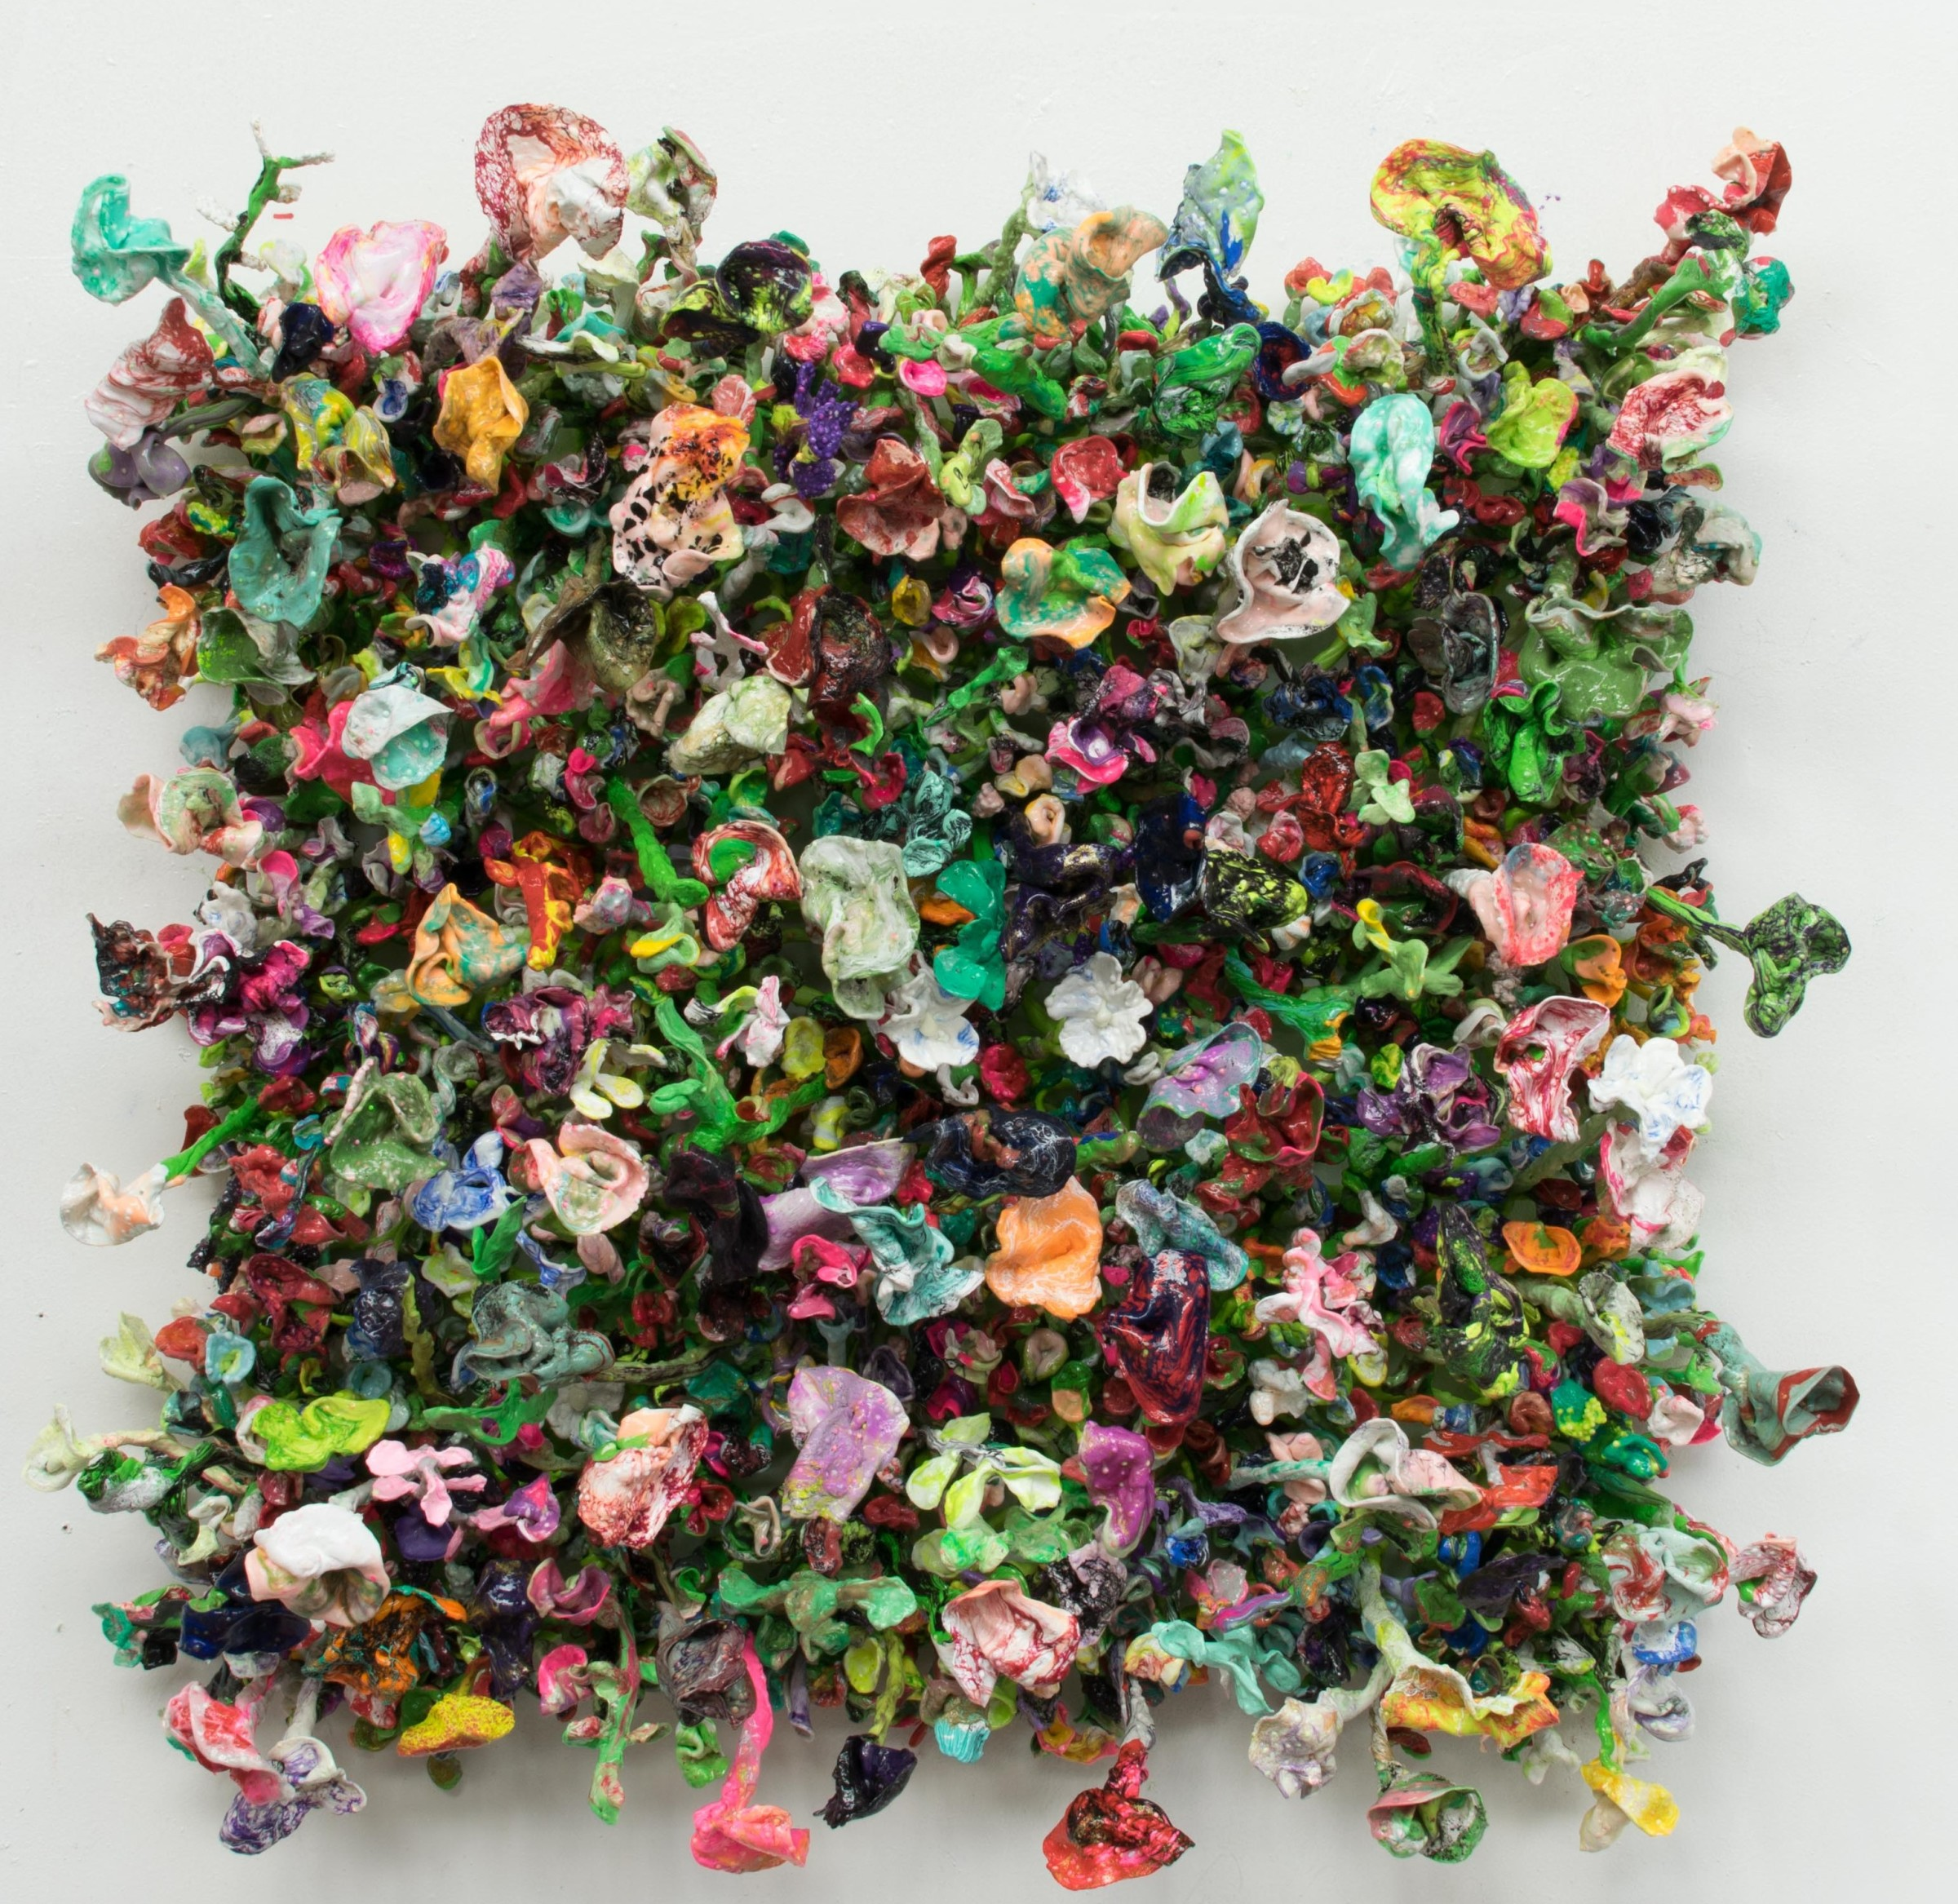 "<span class=""link fancybox-details-link""><a href=""/artists/42-stefan-gross/works/5000-stefan-gross-flower-bonanza-green-2018/"">View Detail Page</a></span><div class=""artist""><strong>Stefan Gross</strong></div> <div class=""title""><em>Flower Bonanza - green</em>, 2018</div> <div class=""medium"">Oil Plastic</div> <div class=""dimensions"">100 x 100 cm</div>"